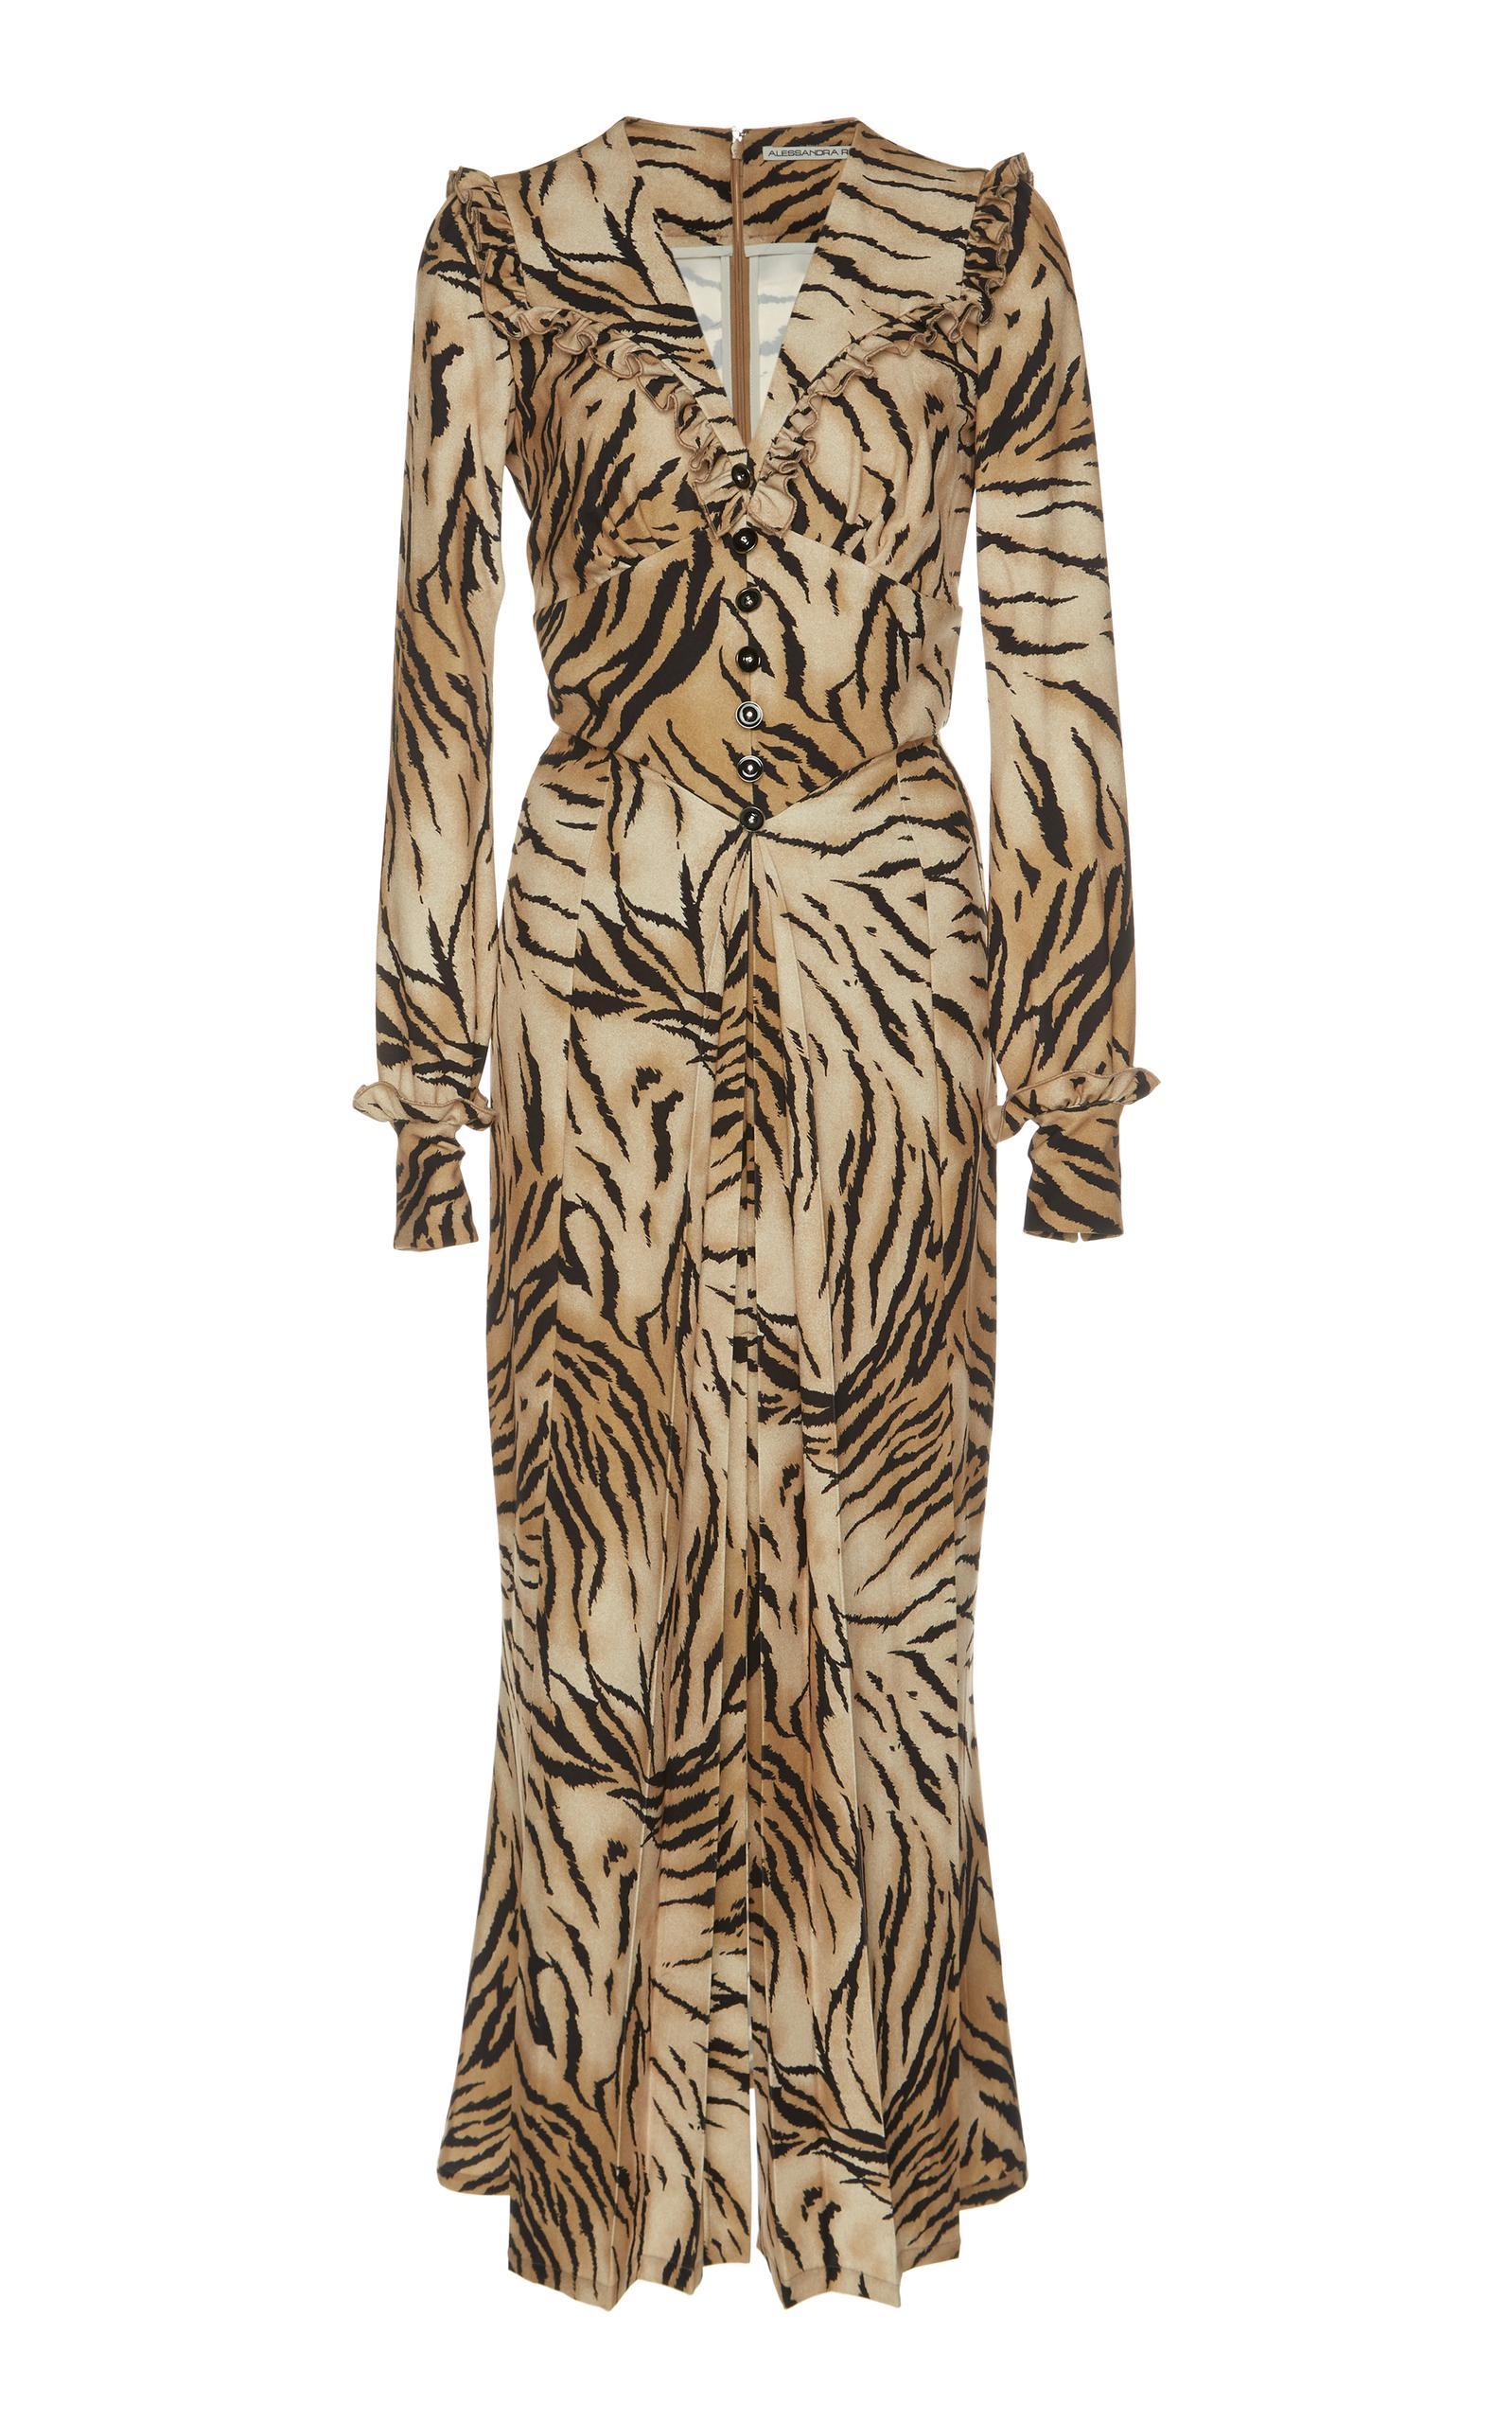 Alessandra Rich Tiger Printed SablÉ Midi Dress In Multi